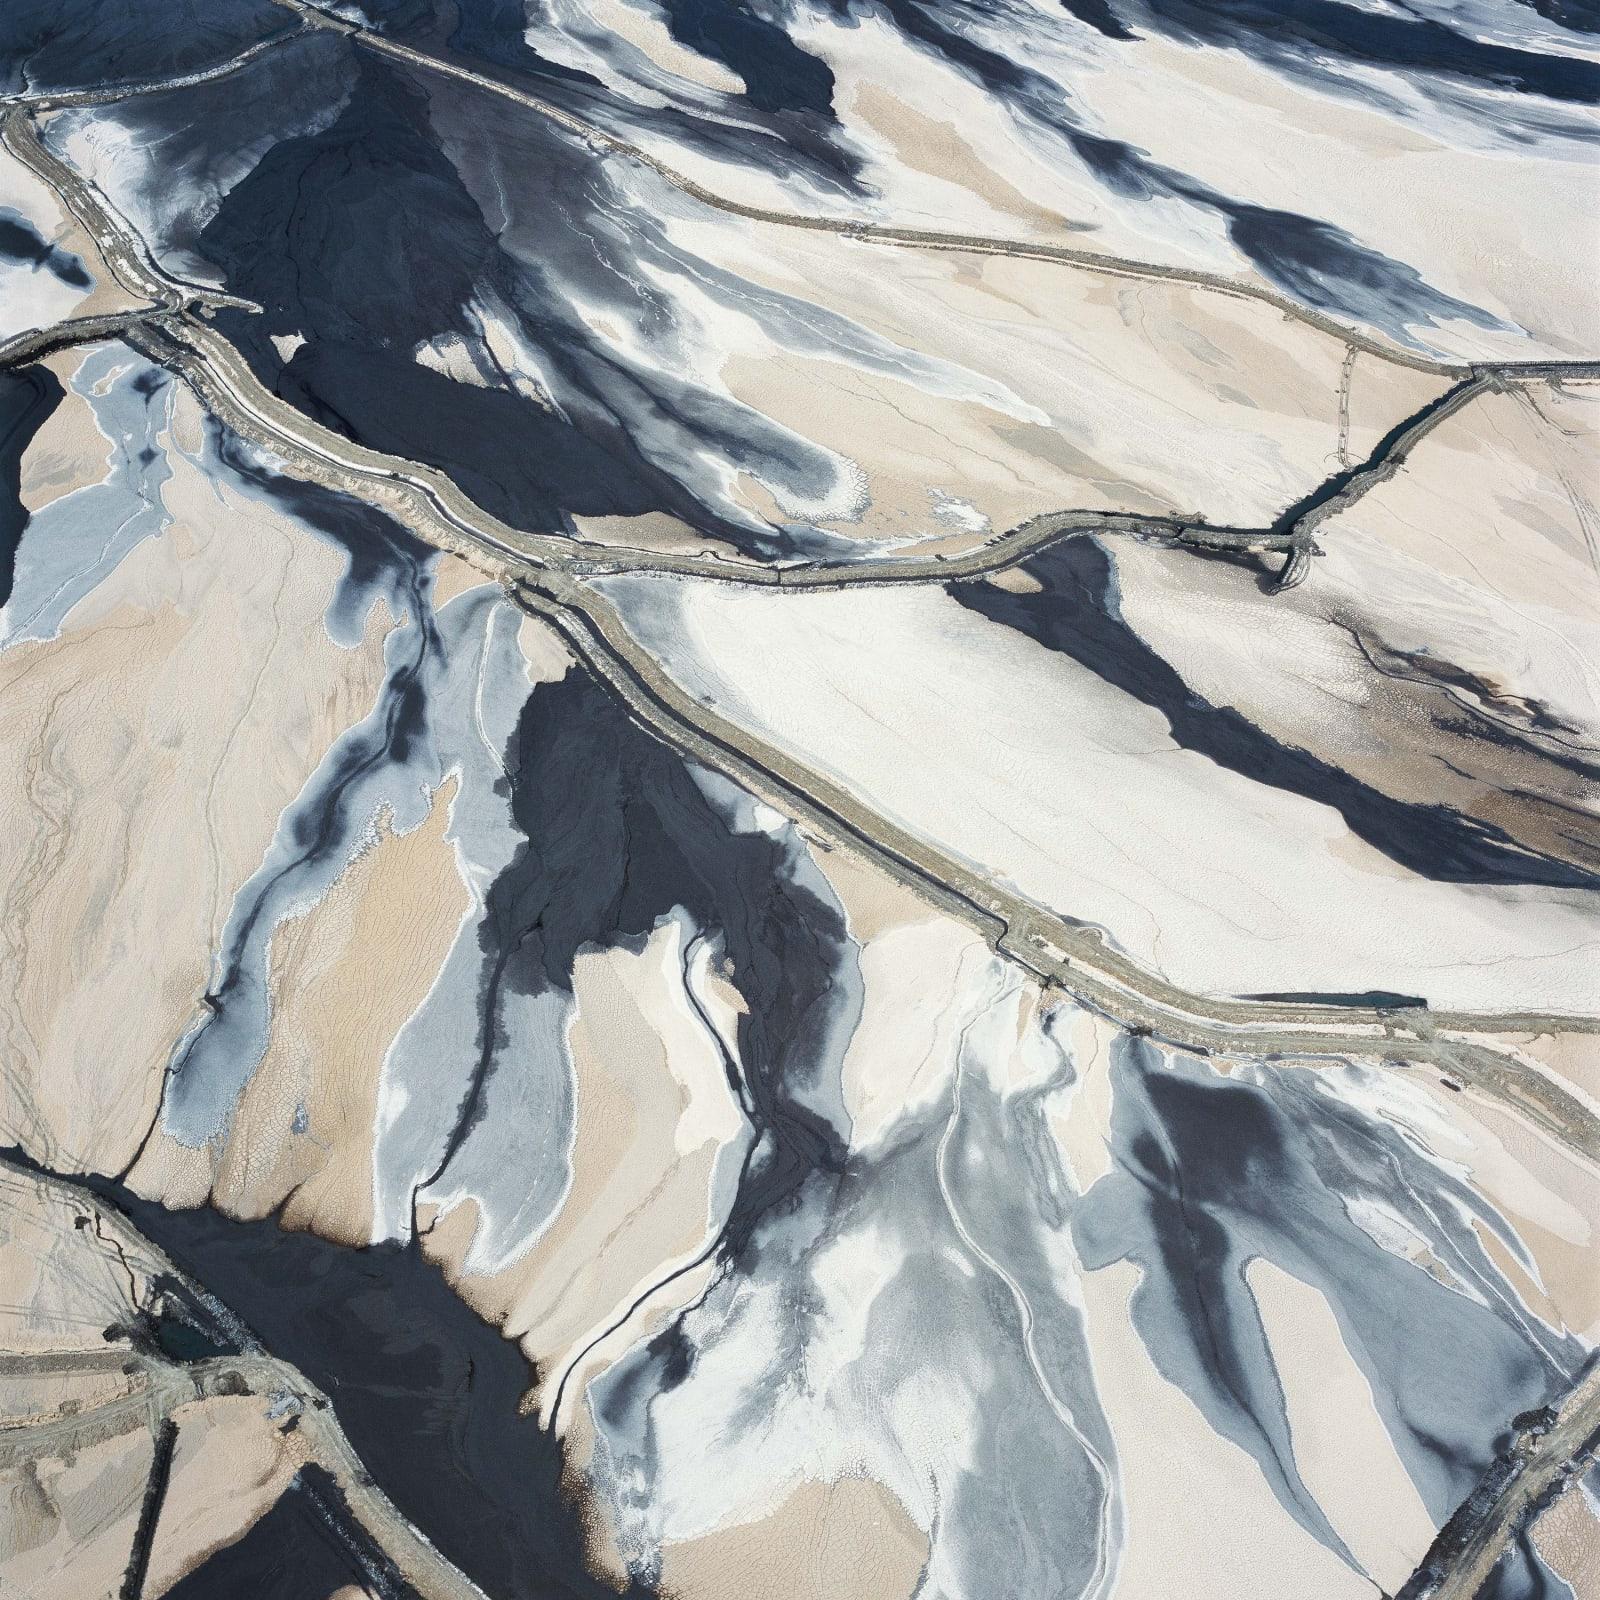 David Maisel, Tailings Pond 1, Minera Centinela Copper Mine, Antofagasta Region, Atacama, Chile, 2018